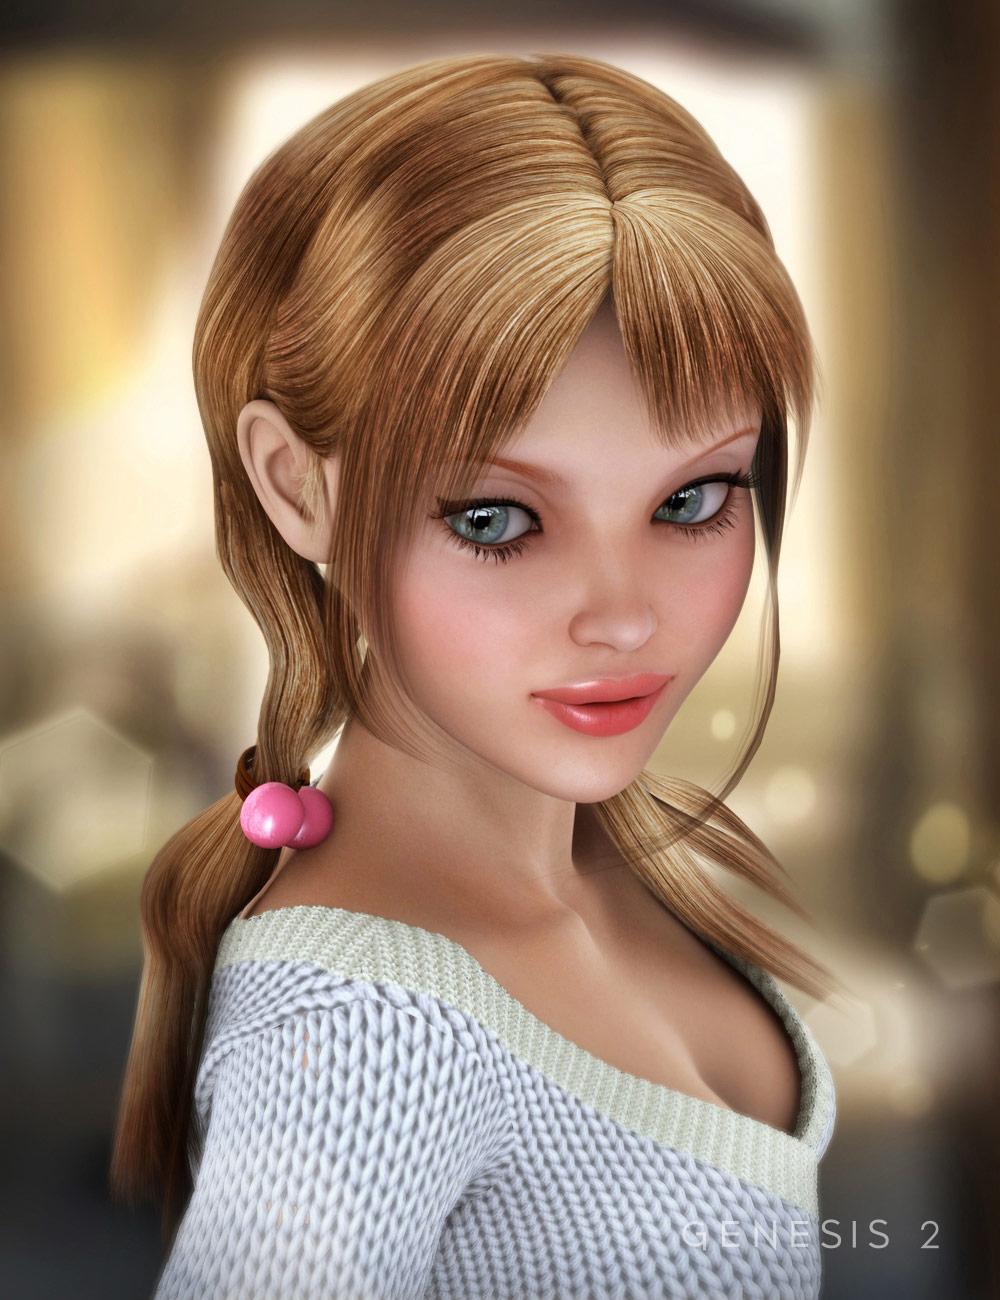 Sora Hair by: EmmaAndJordi, 3D Models by Daz 3D